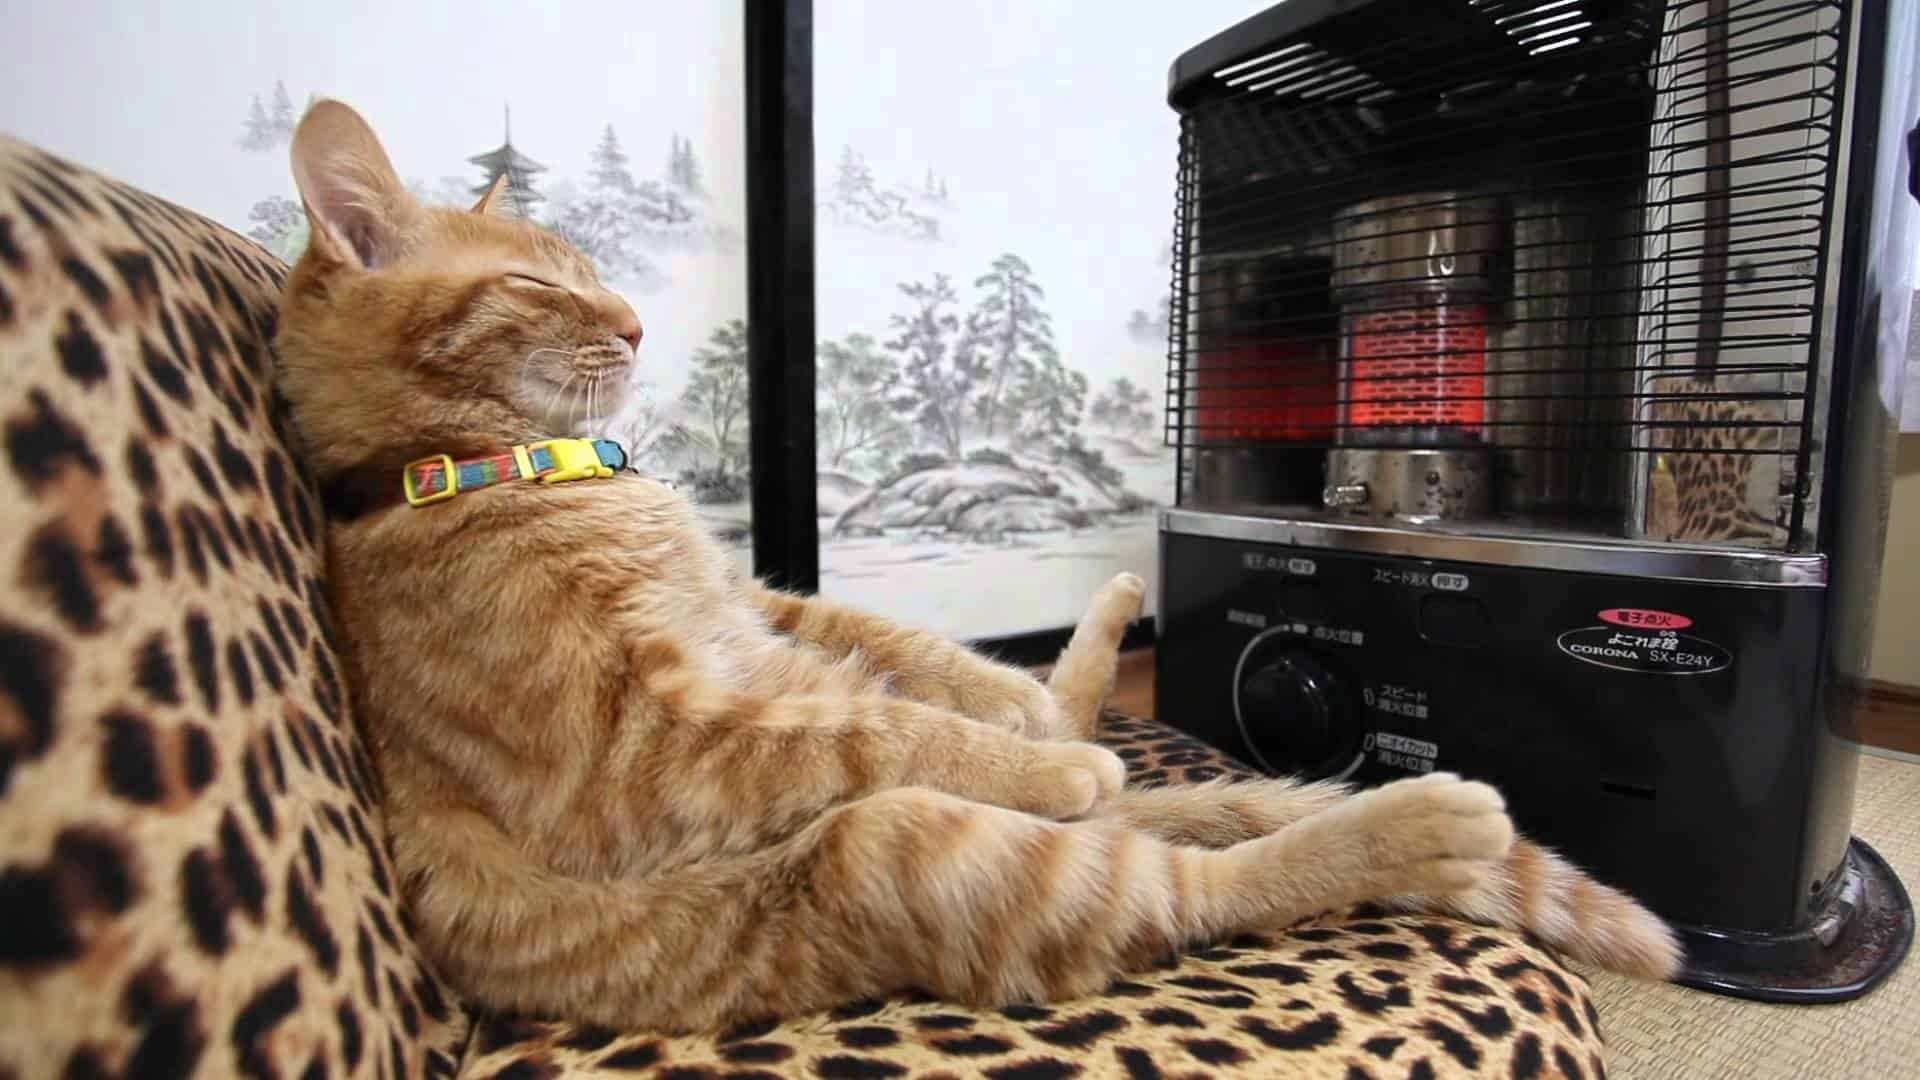 Katze entspannt vor der heizung dravens tales from the crypt for Couch vor heizung